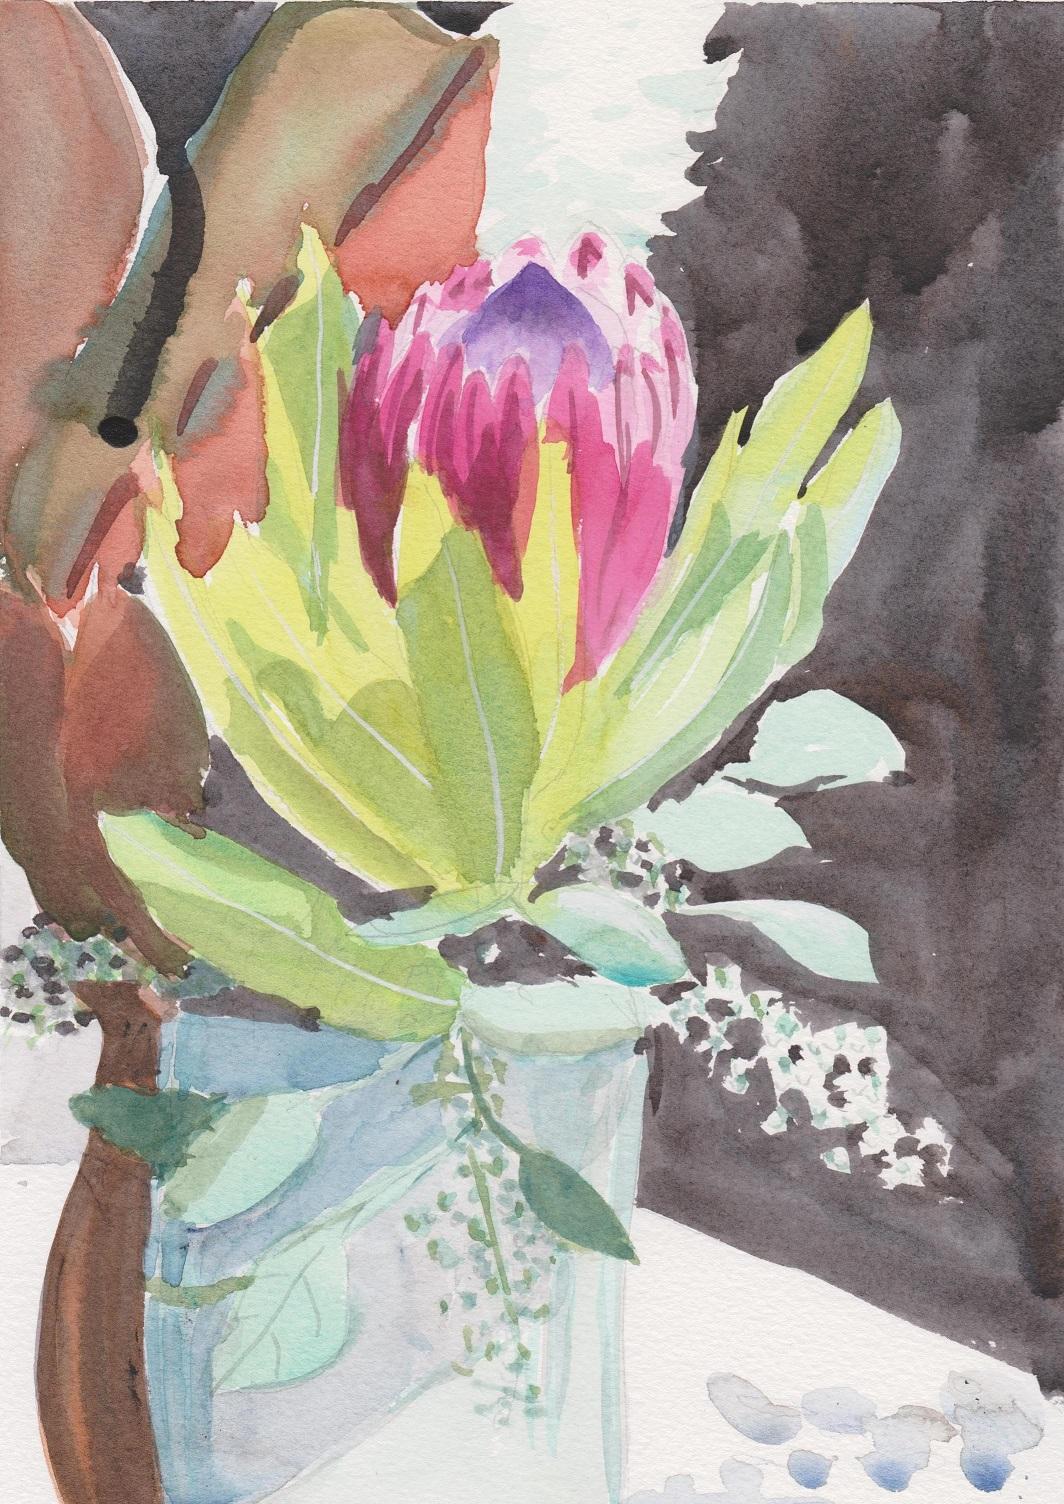 Protea bloom with eucalyptus in vase